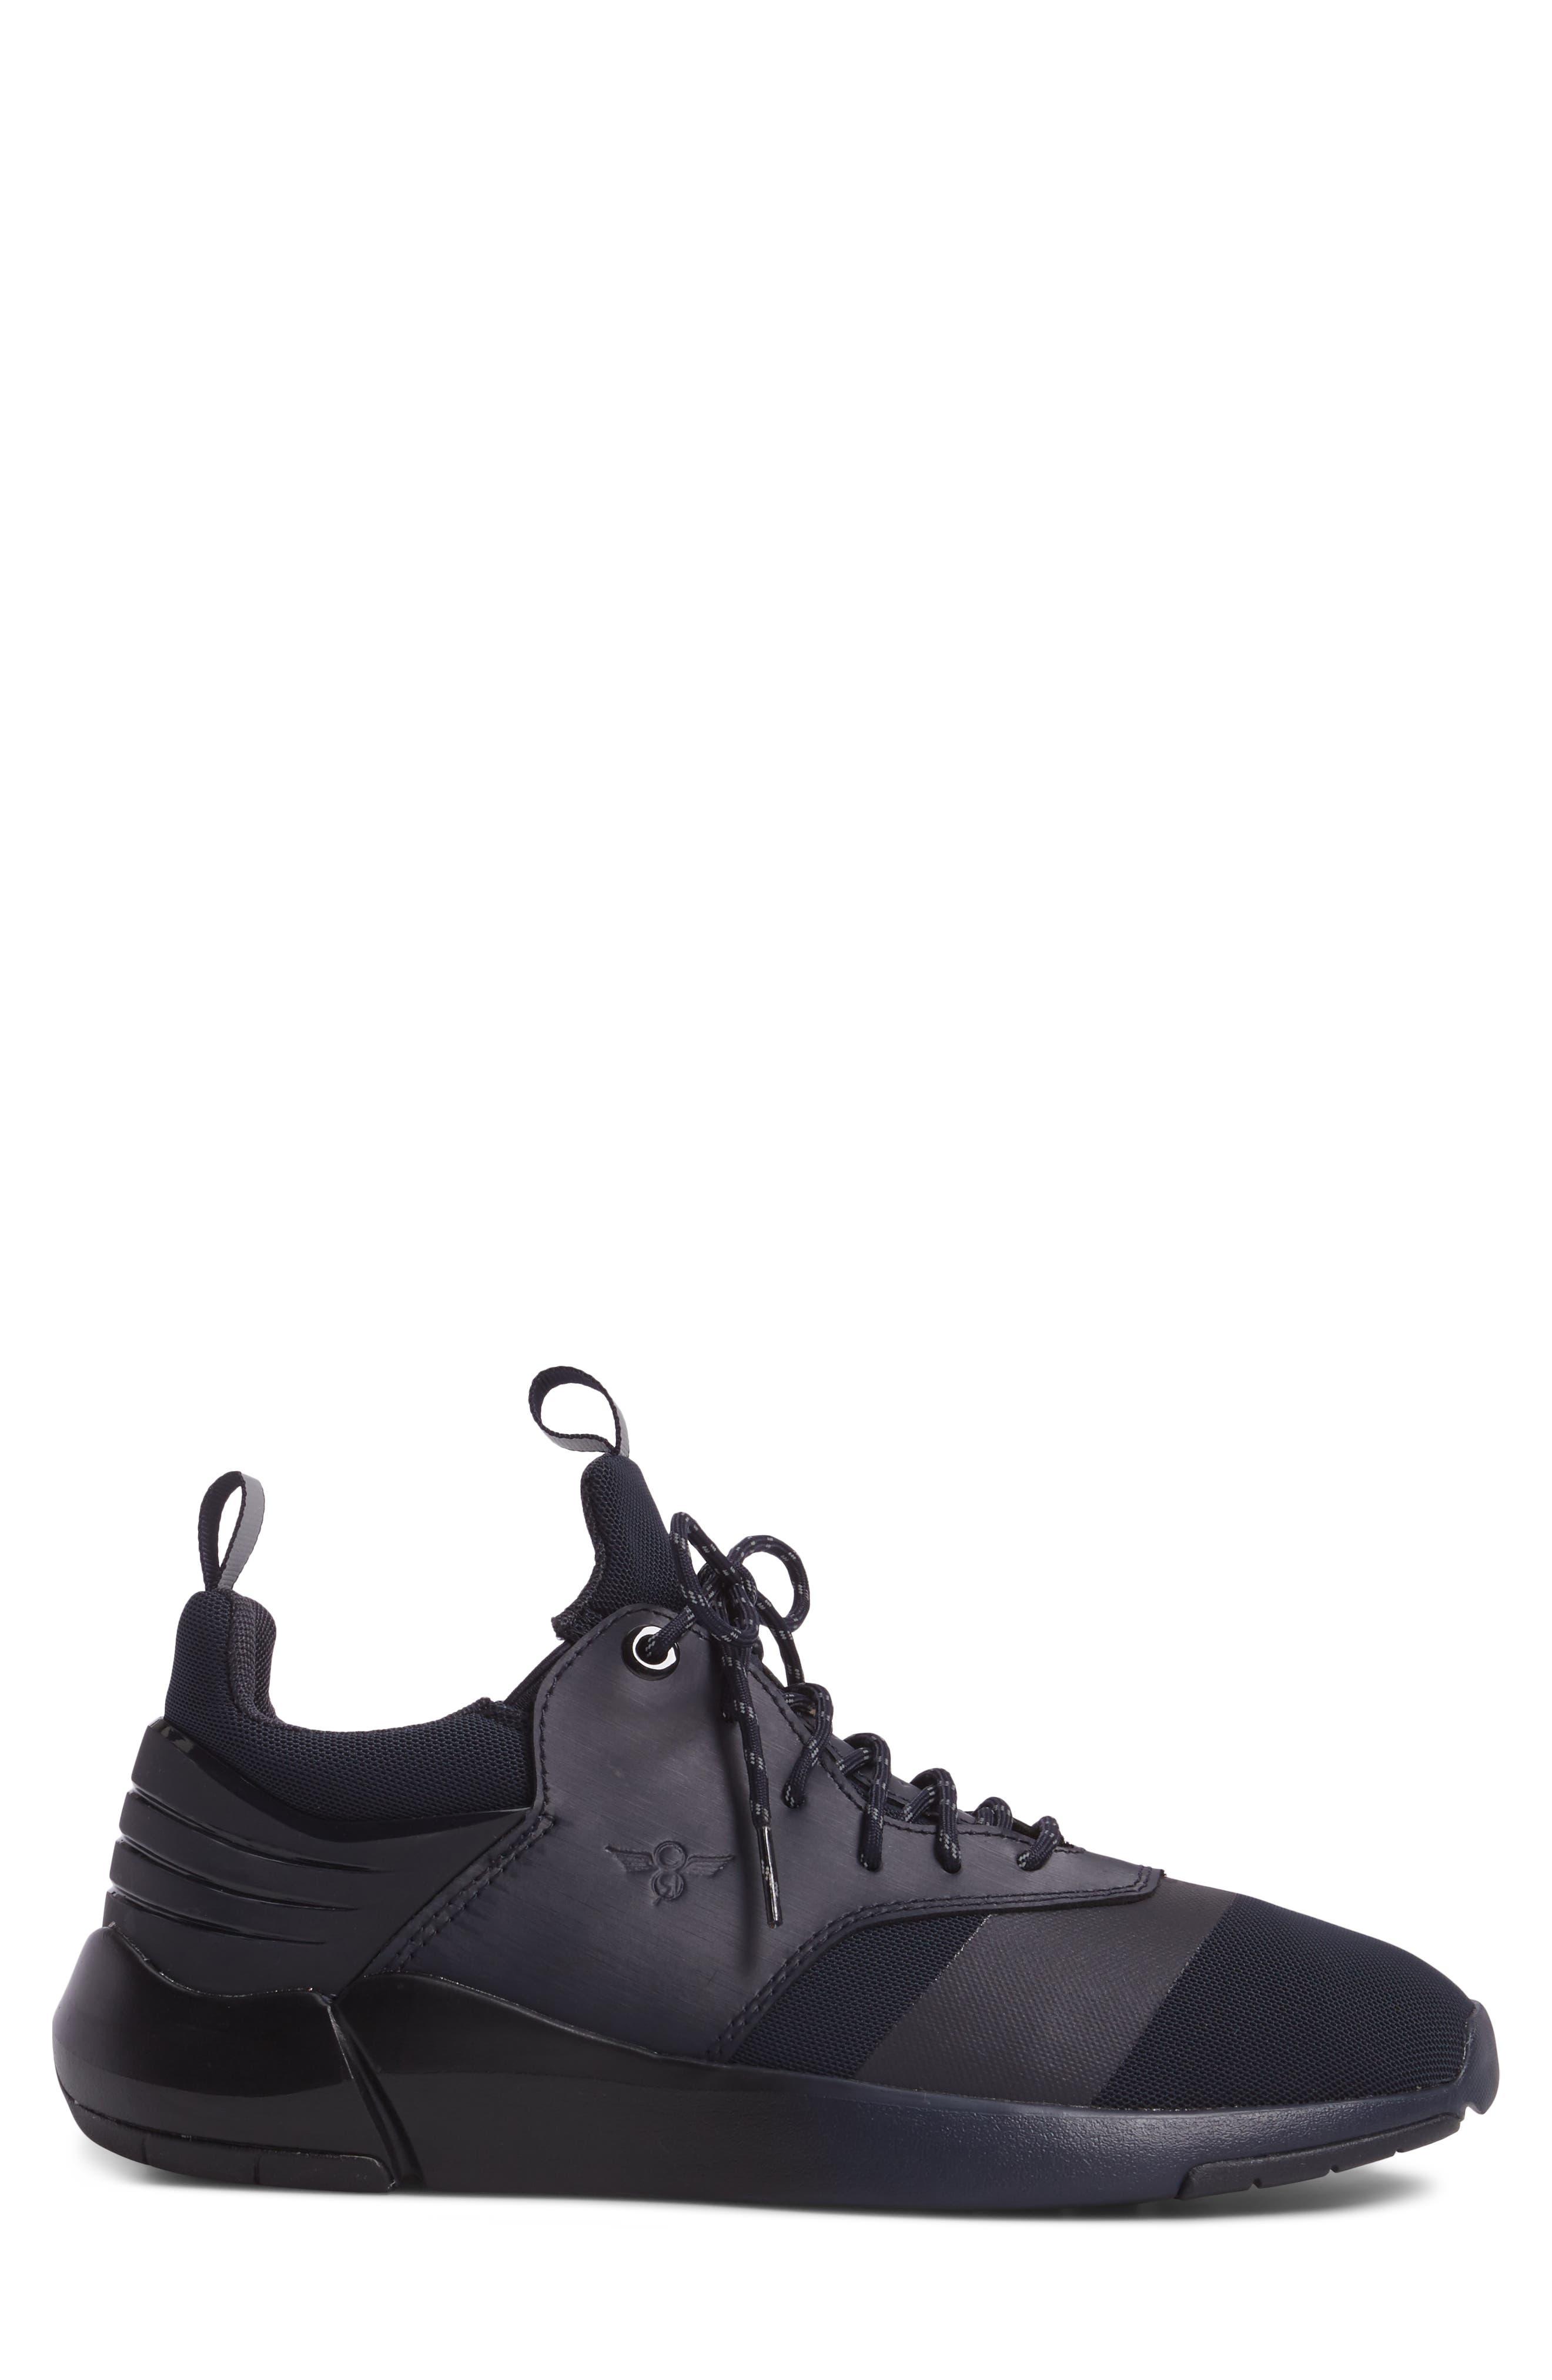 Motus Sneaker,                             Alternate thumbnail 3, color,                             Navy Reflective Leather